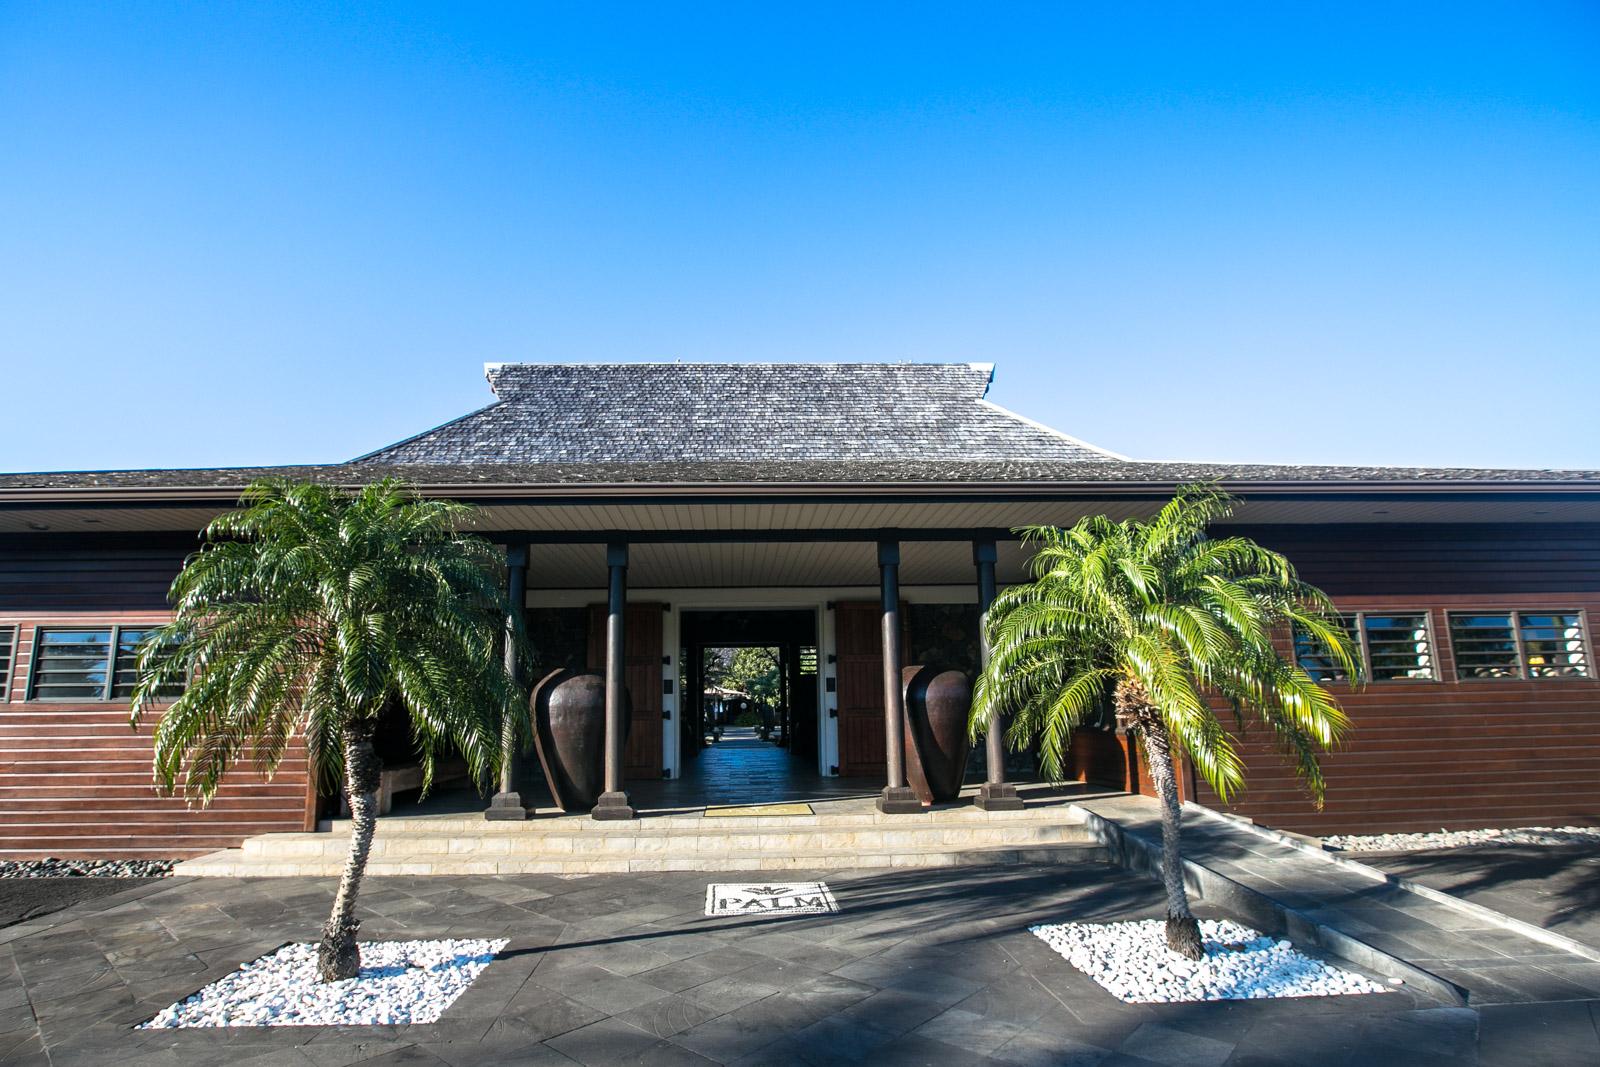 Palm Hotel La Reunion, Unterkünfte La Reunion, Hotels, Rundreise, Roadtrip, Tipps